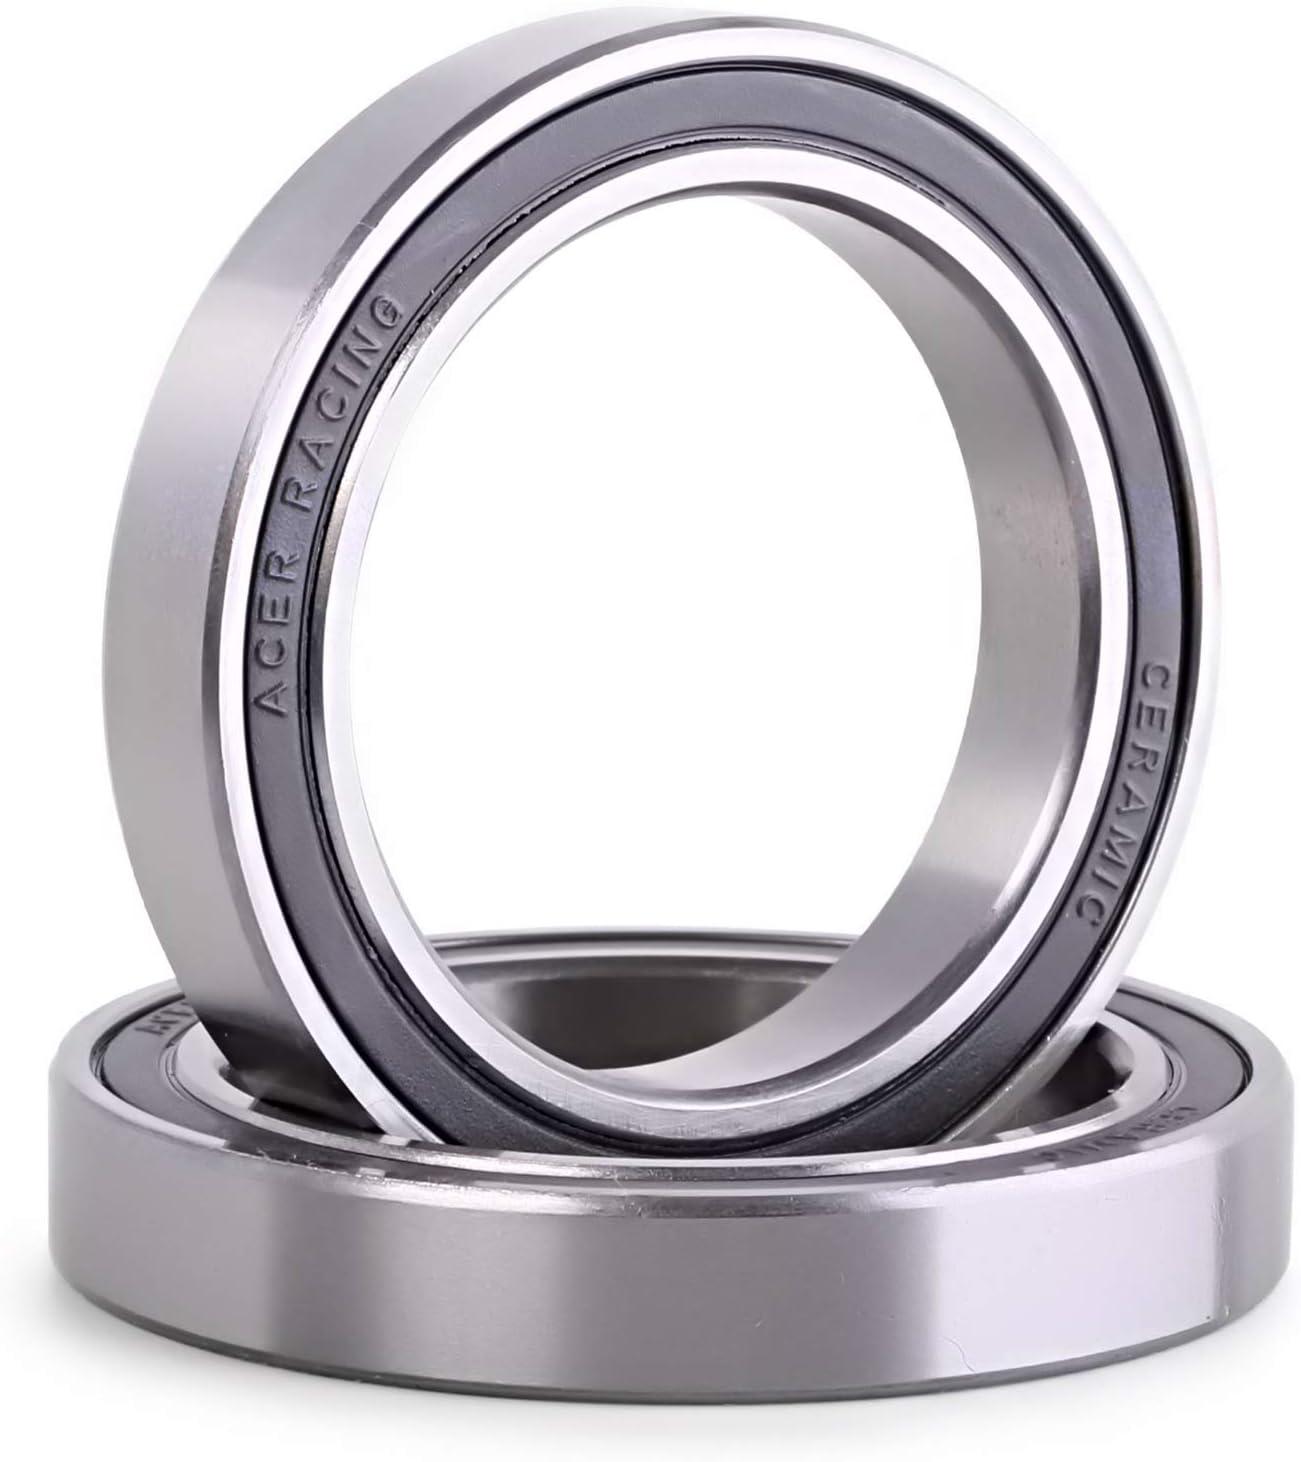 Ceramic bearing Spinning Top Que